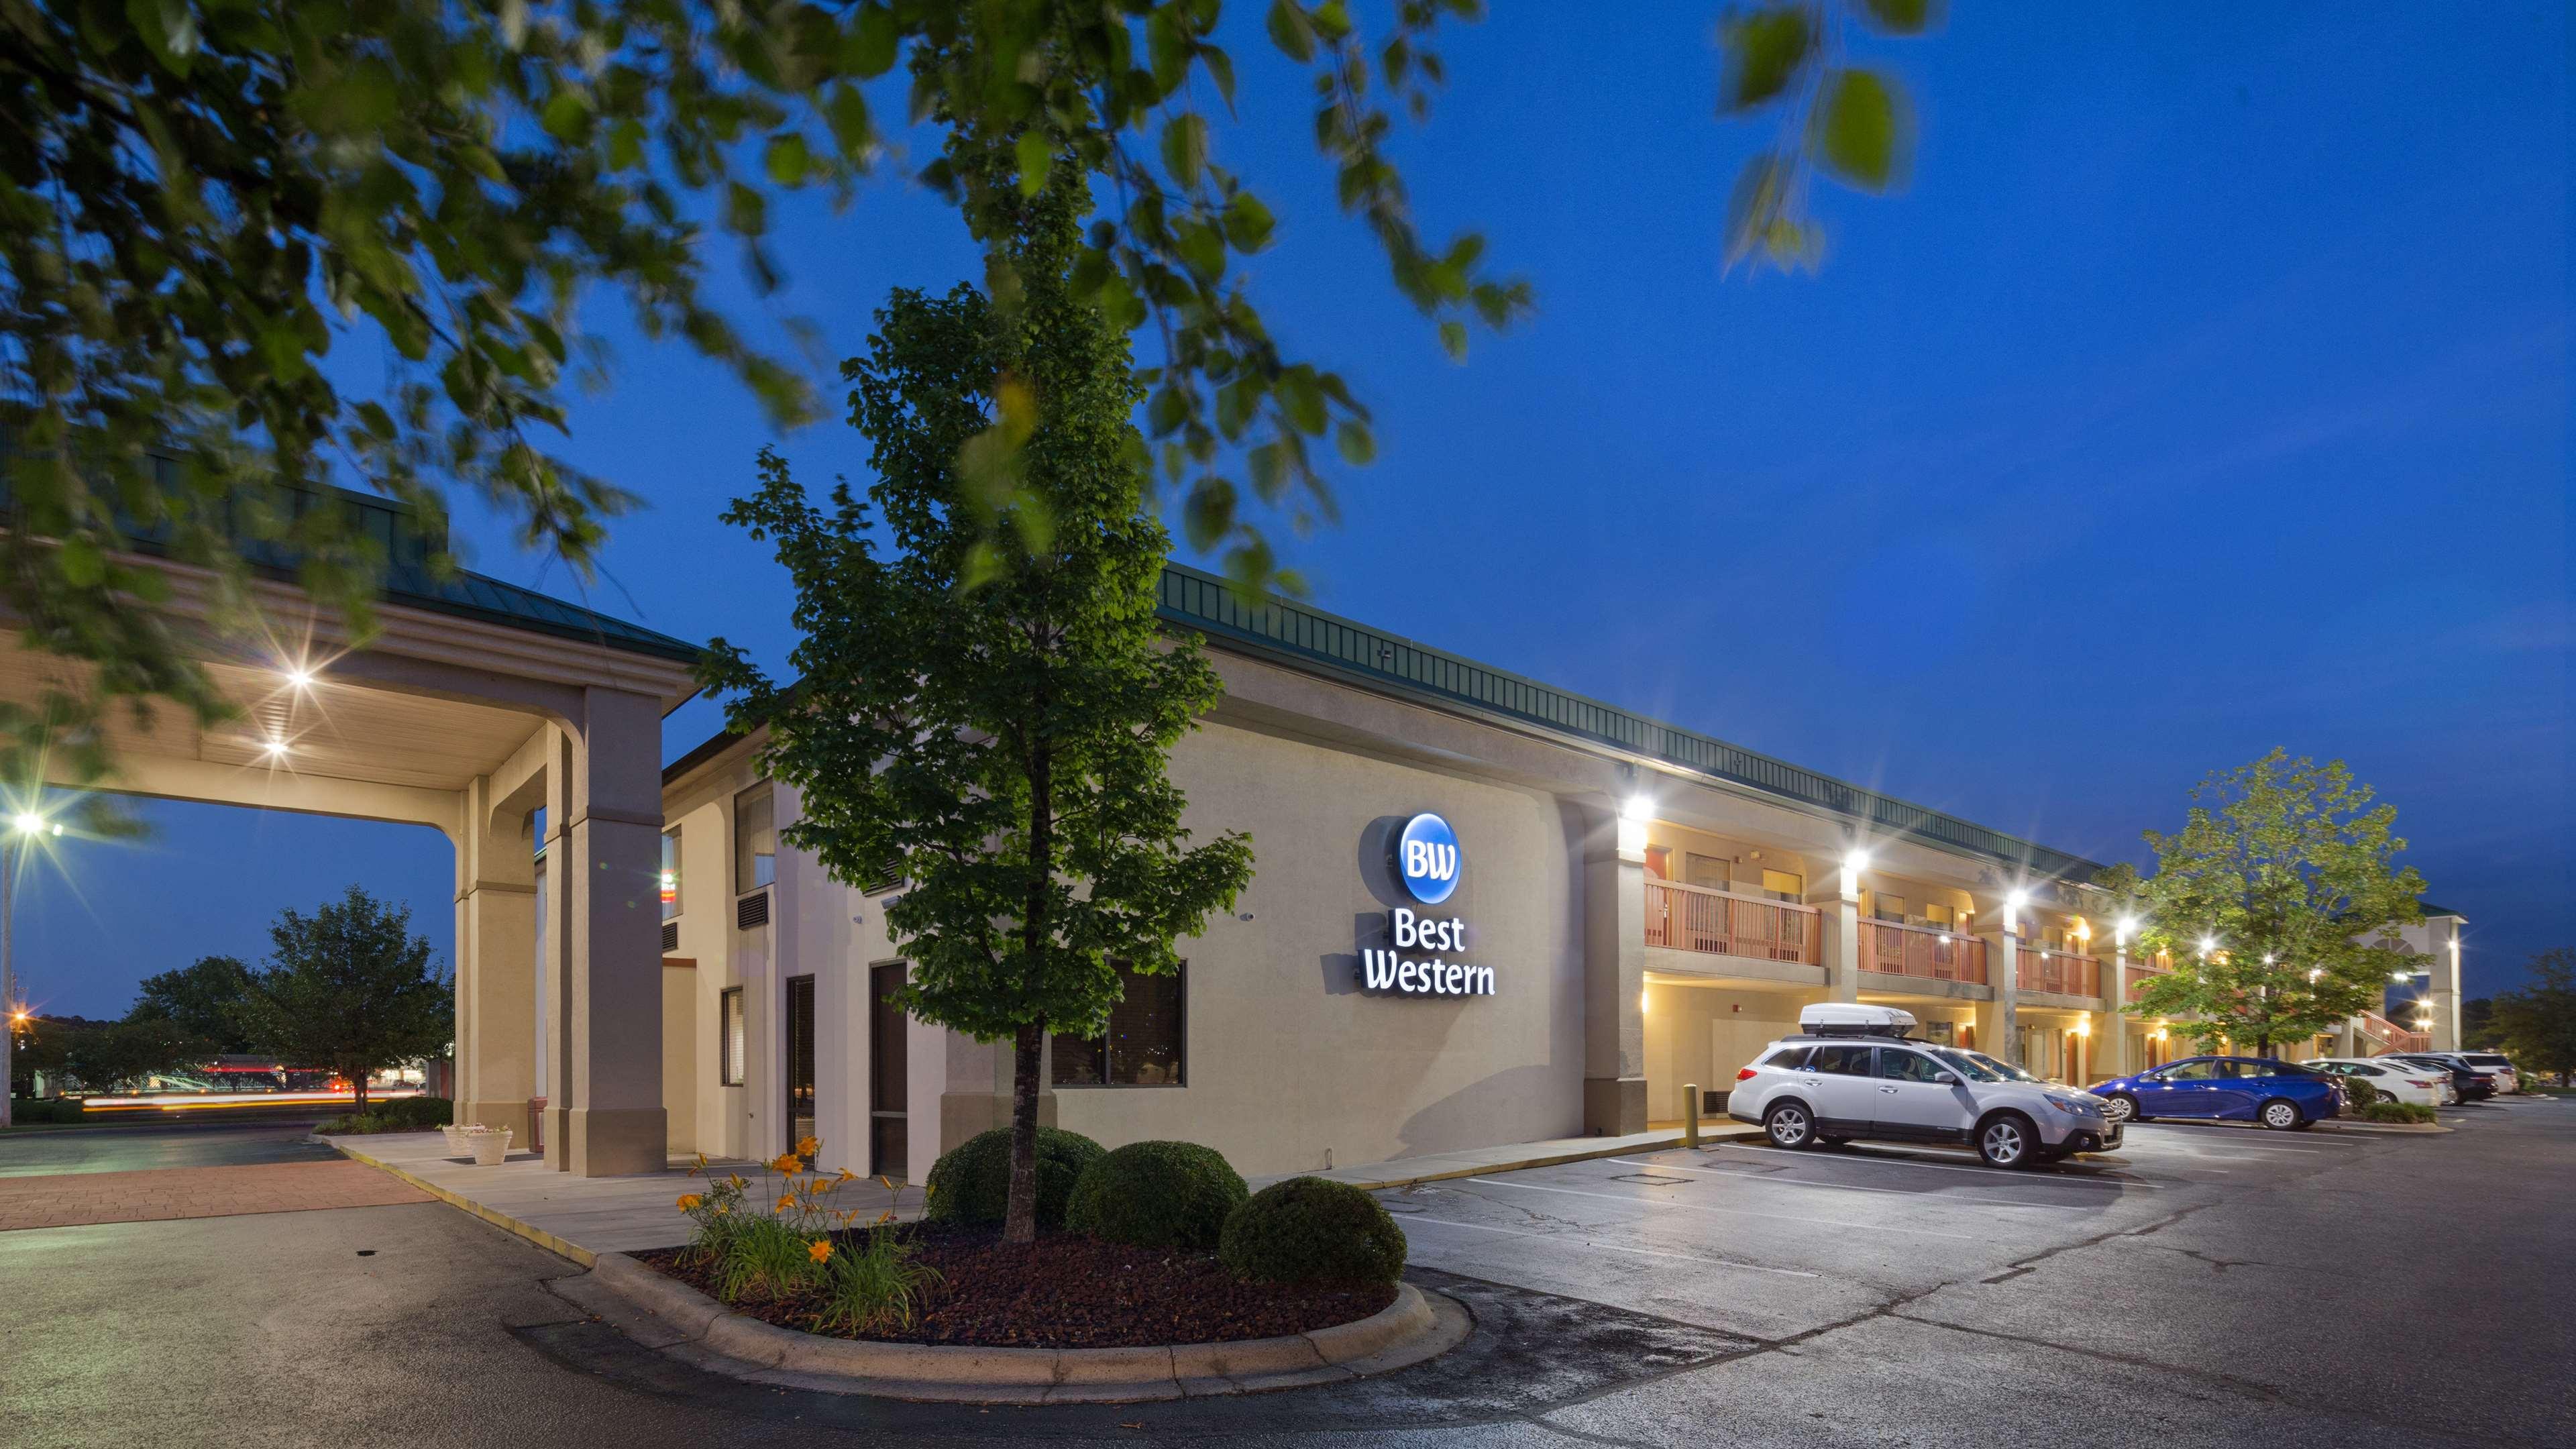 Best Western Hotel Lumberton North Carolina